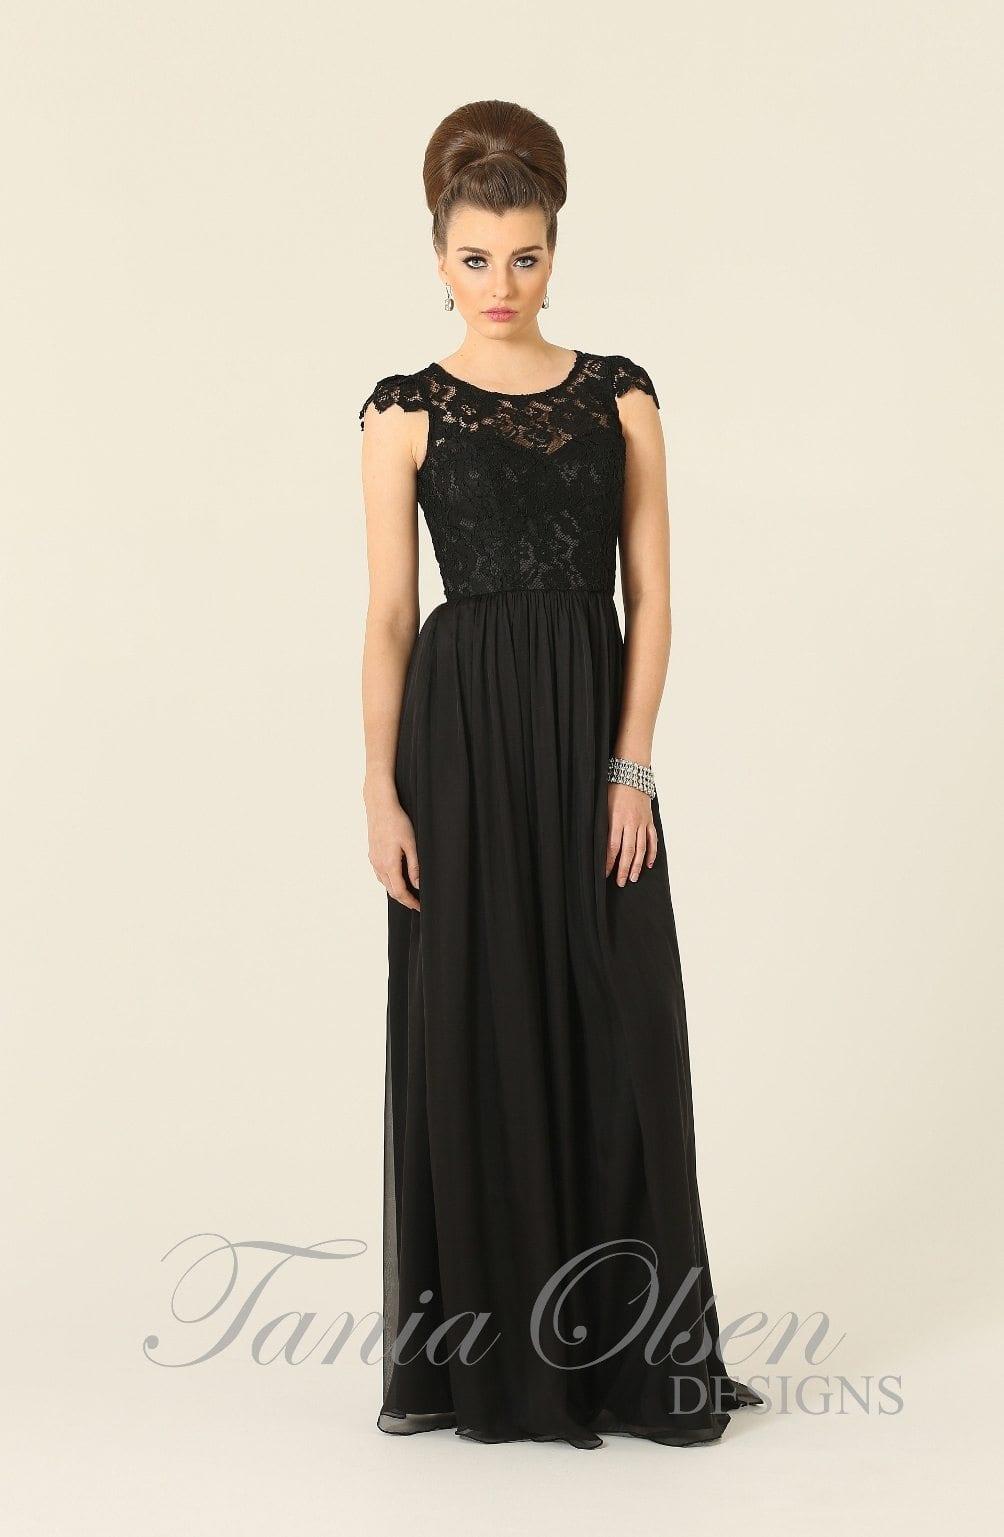 Bridesmaid dress tania olsen design latitia black for Jessica designs international wedding dresses